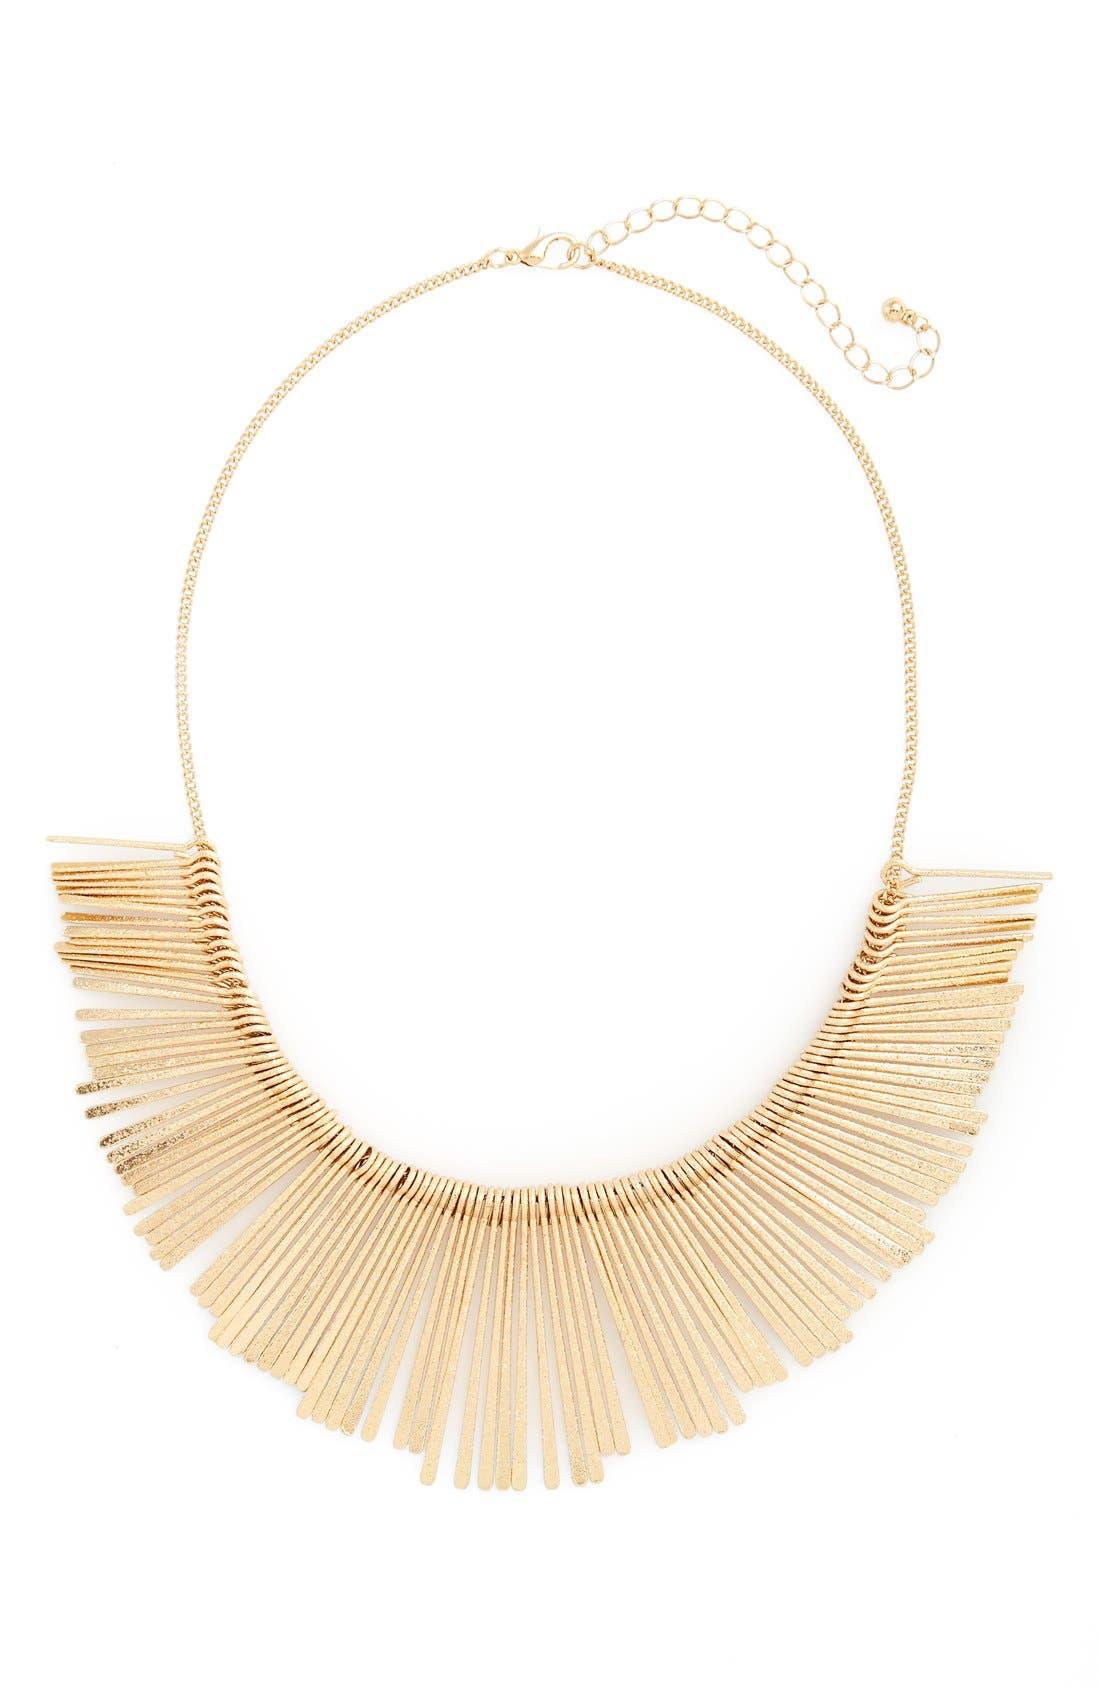 Stick Bib Necklace,                         Main,                         color, 710